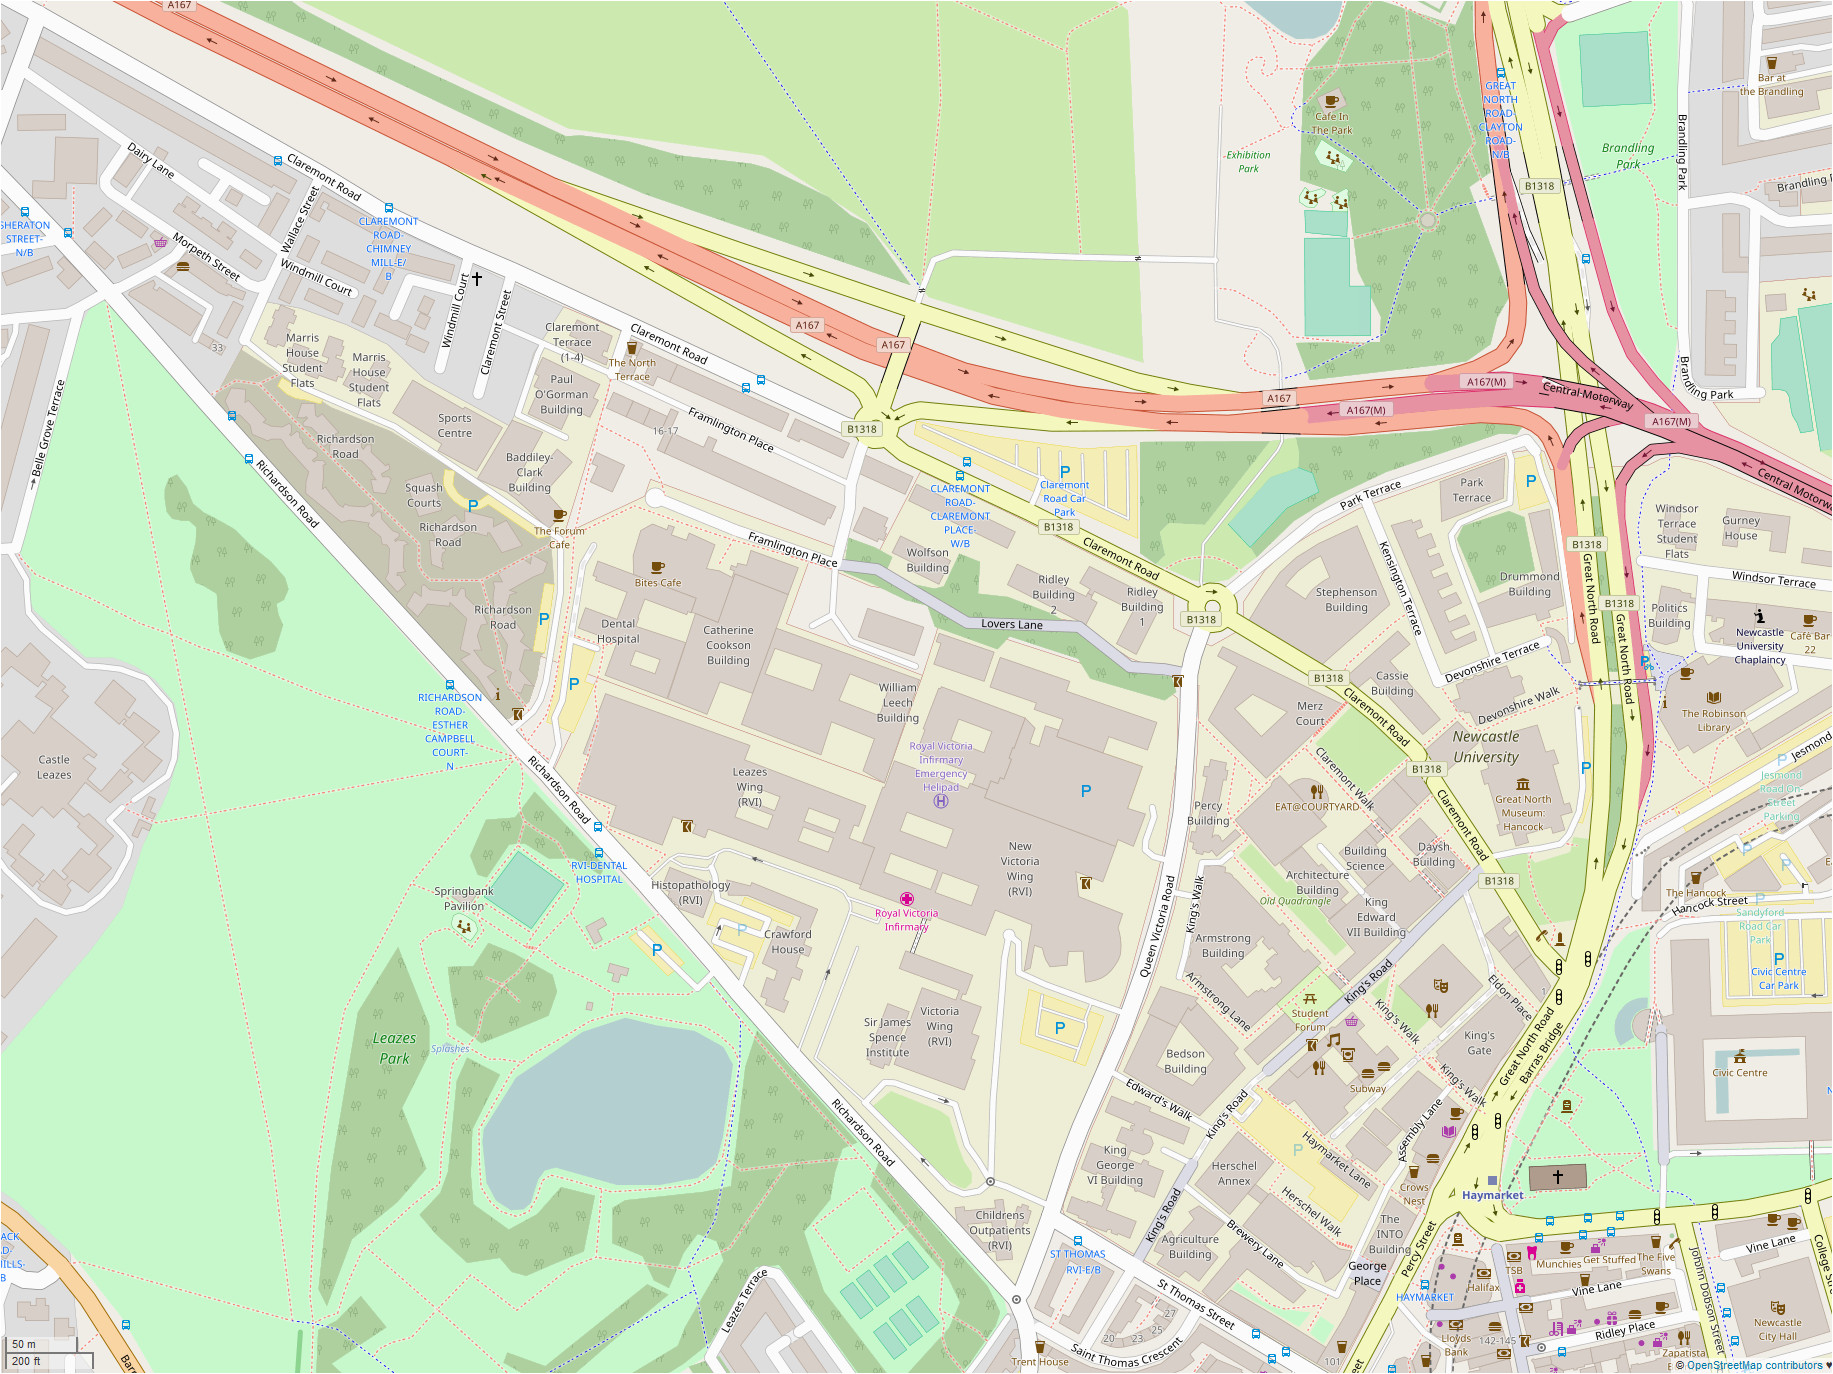 England Map Newcastle File Newcastle University Open Street Map Png Wikimedia Commons